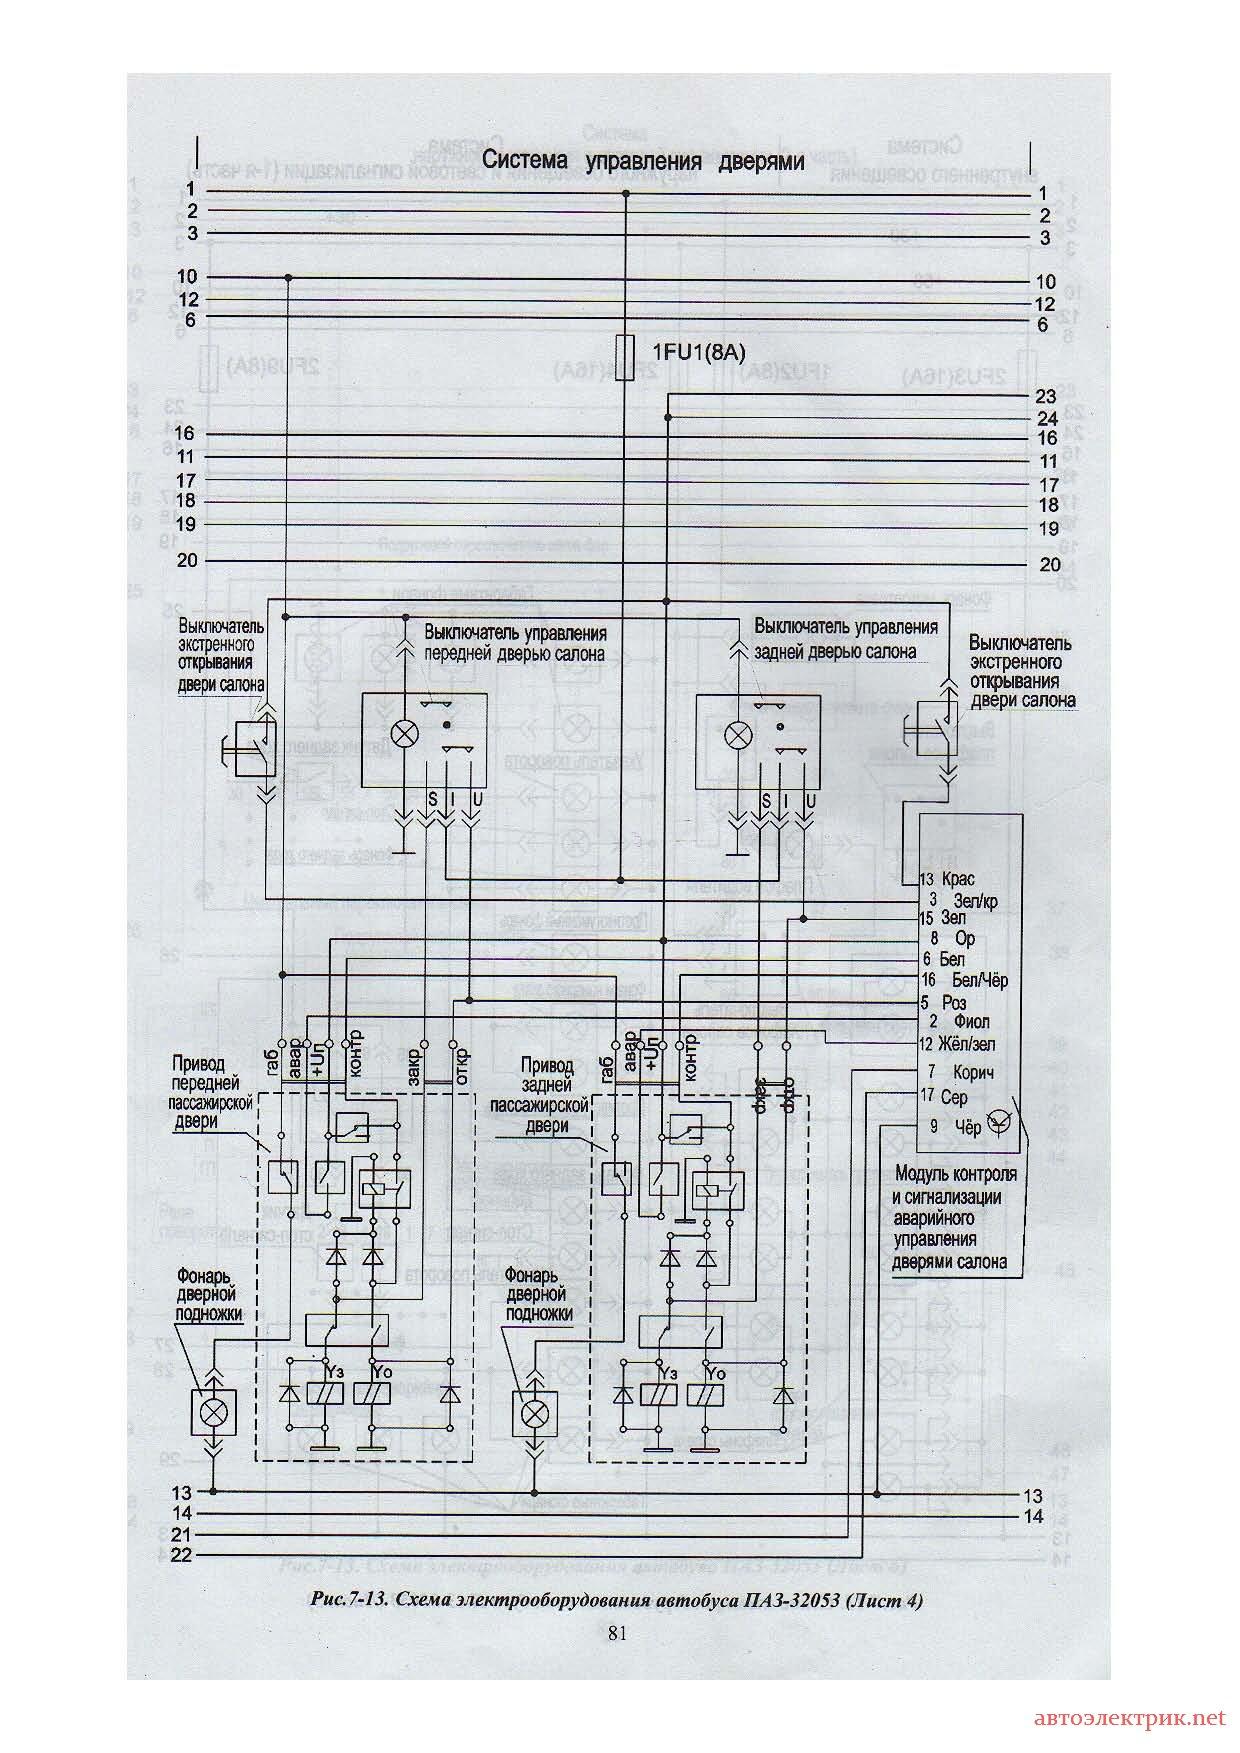 электропроводка паз 32054 схема гражданство